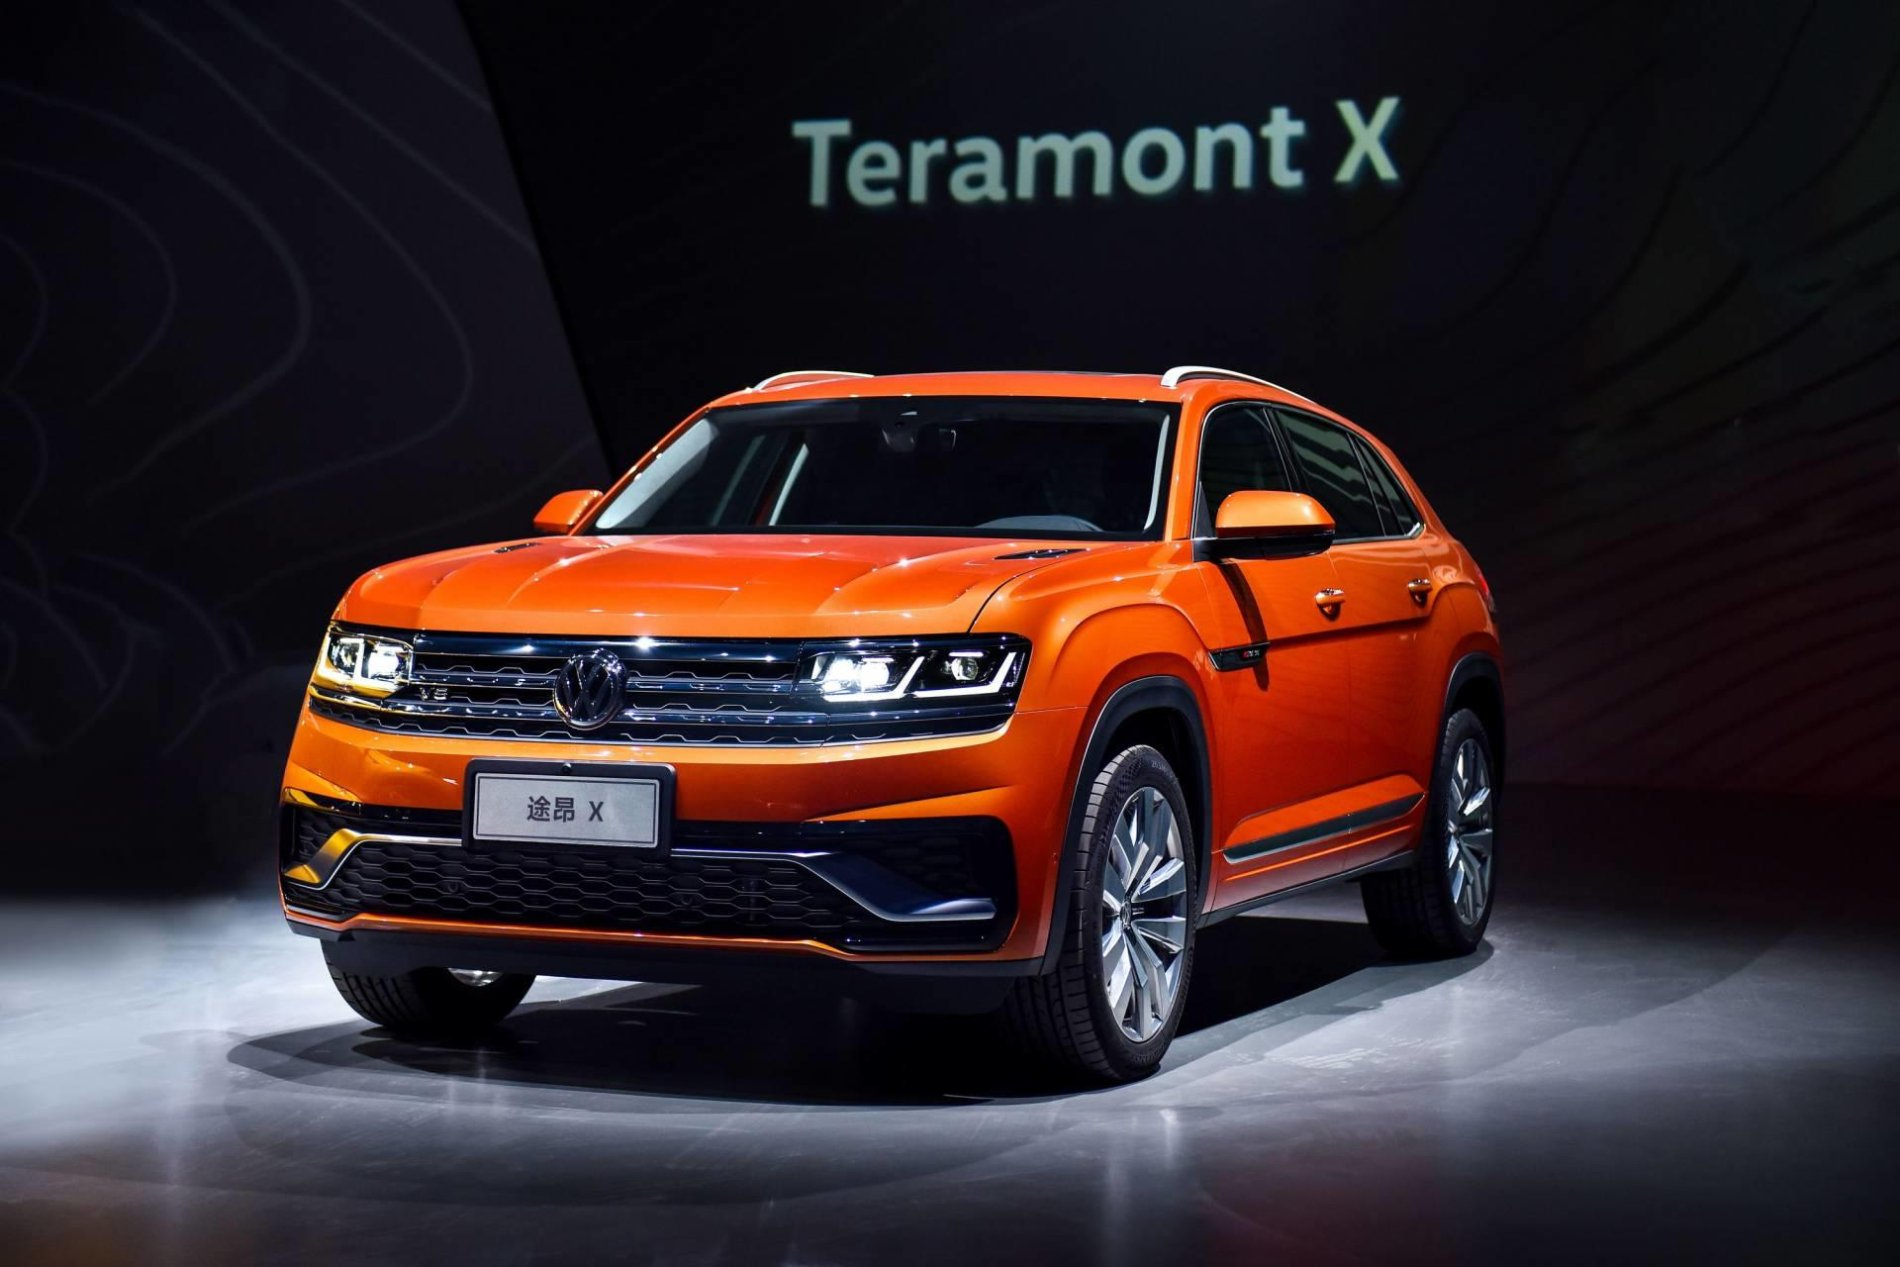 Volkswagen Teramont X - Volkswagen Teramont X